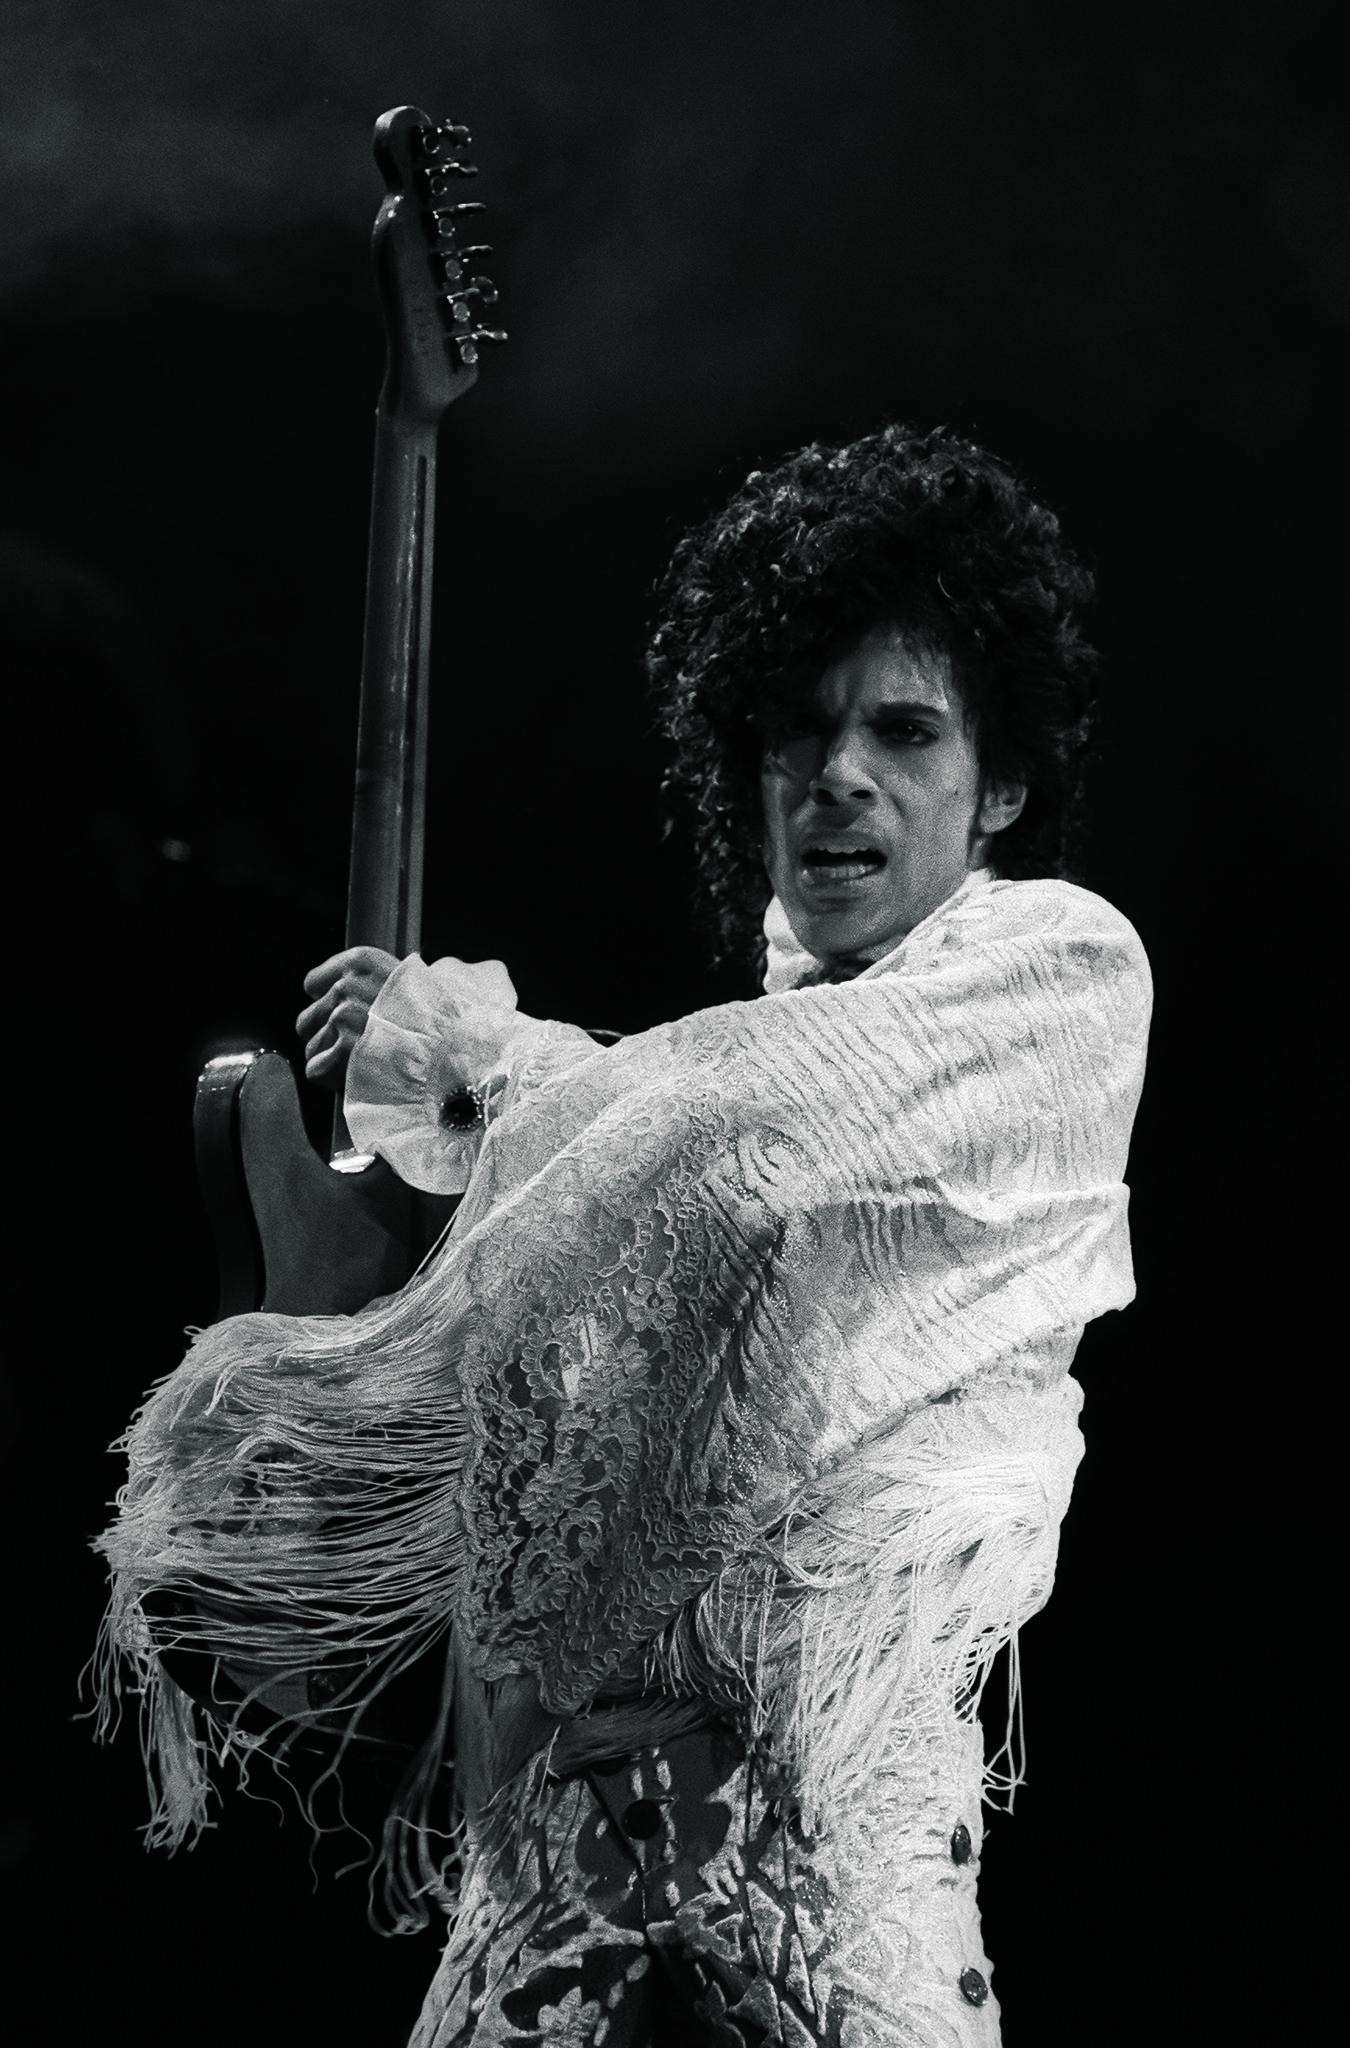 Prince at the Greensboro Coliseum in North Carolina, Nov. 14, 1984.